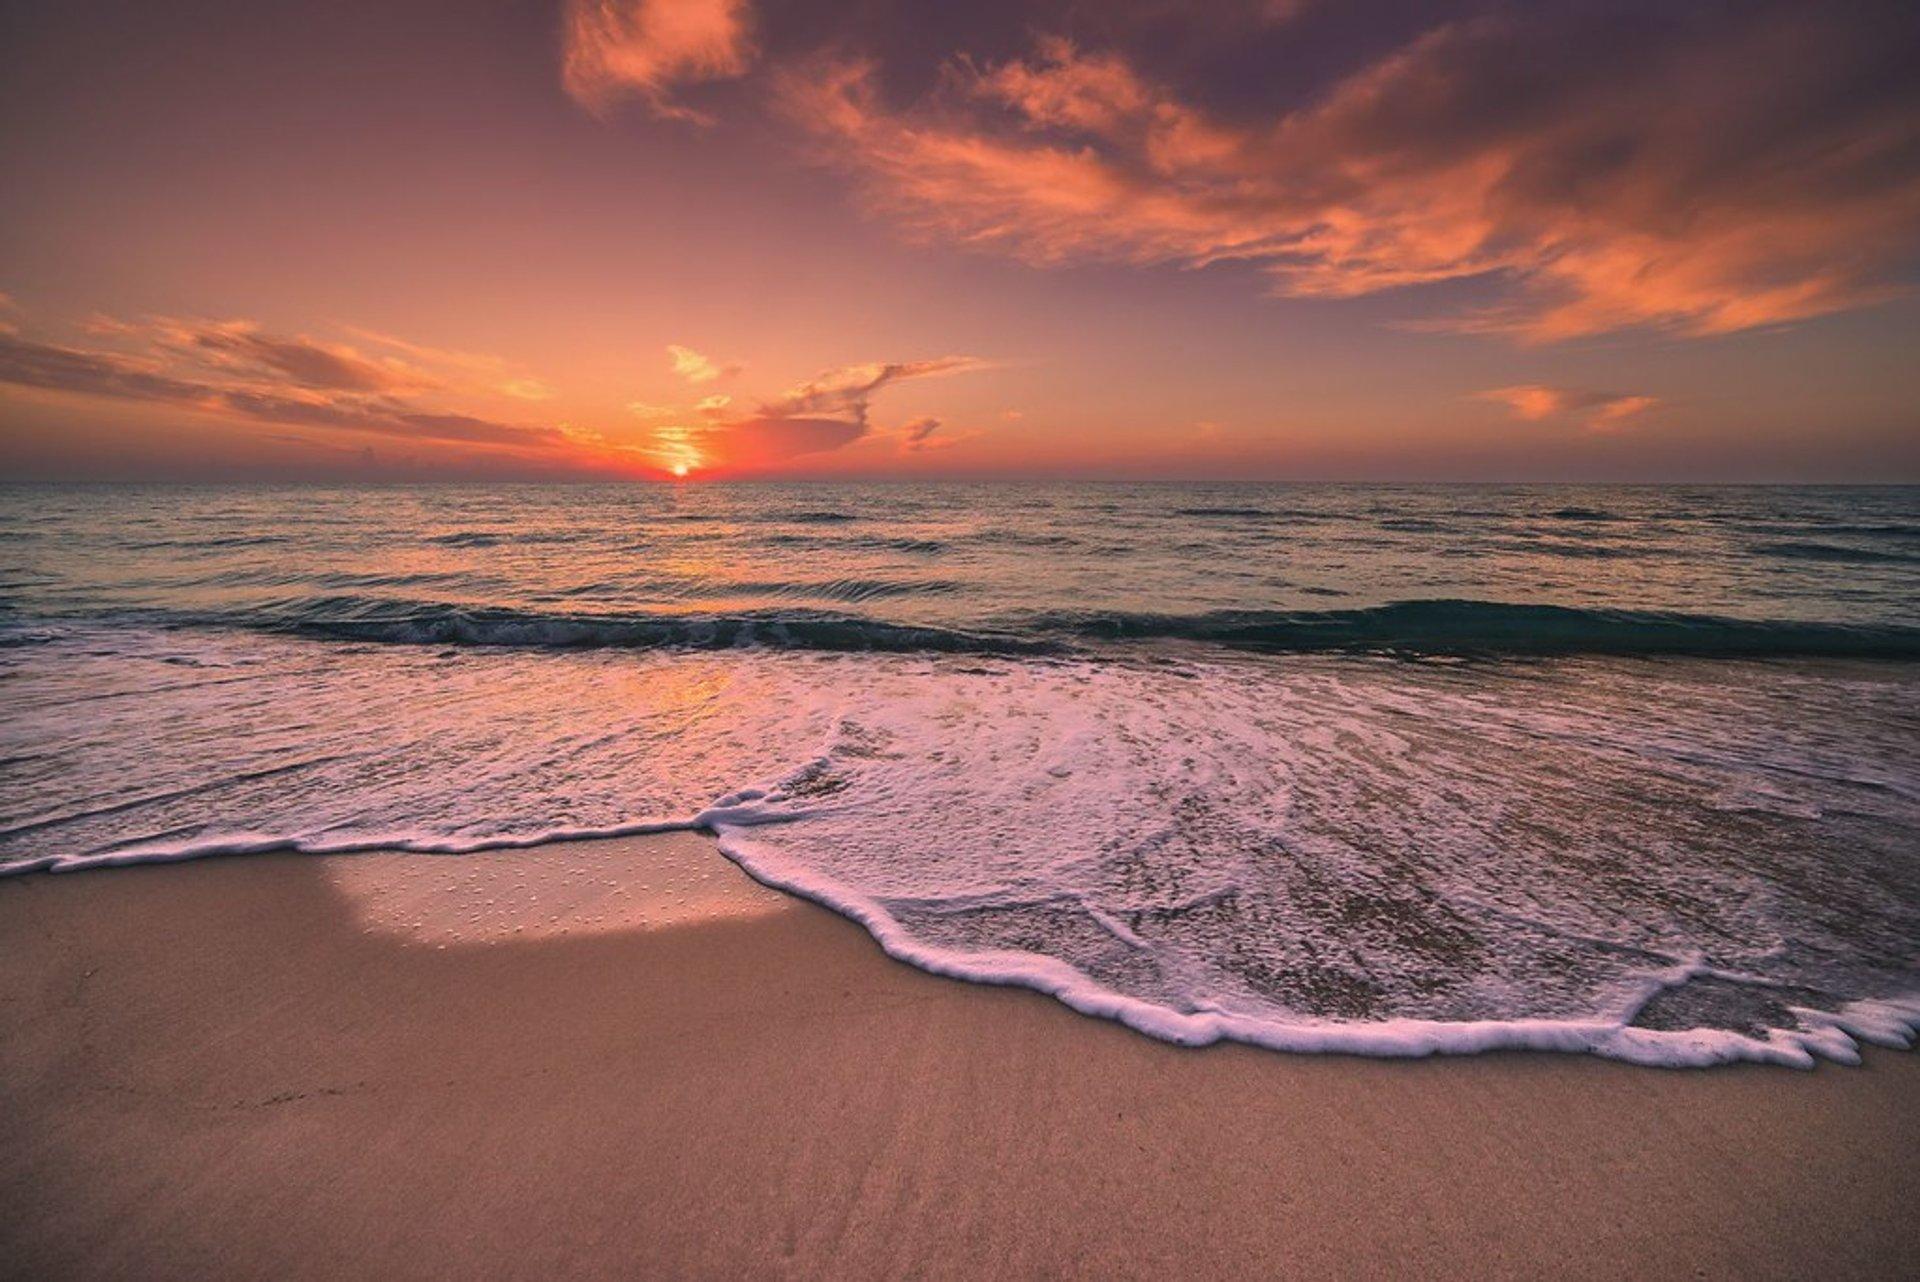 Beach Season in Tunisia 2020 - Best Time